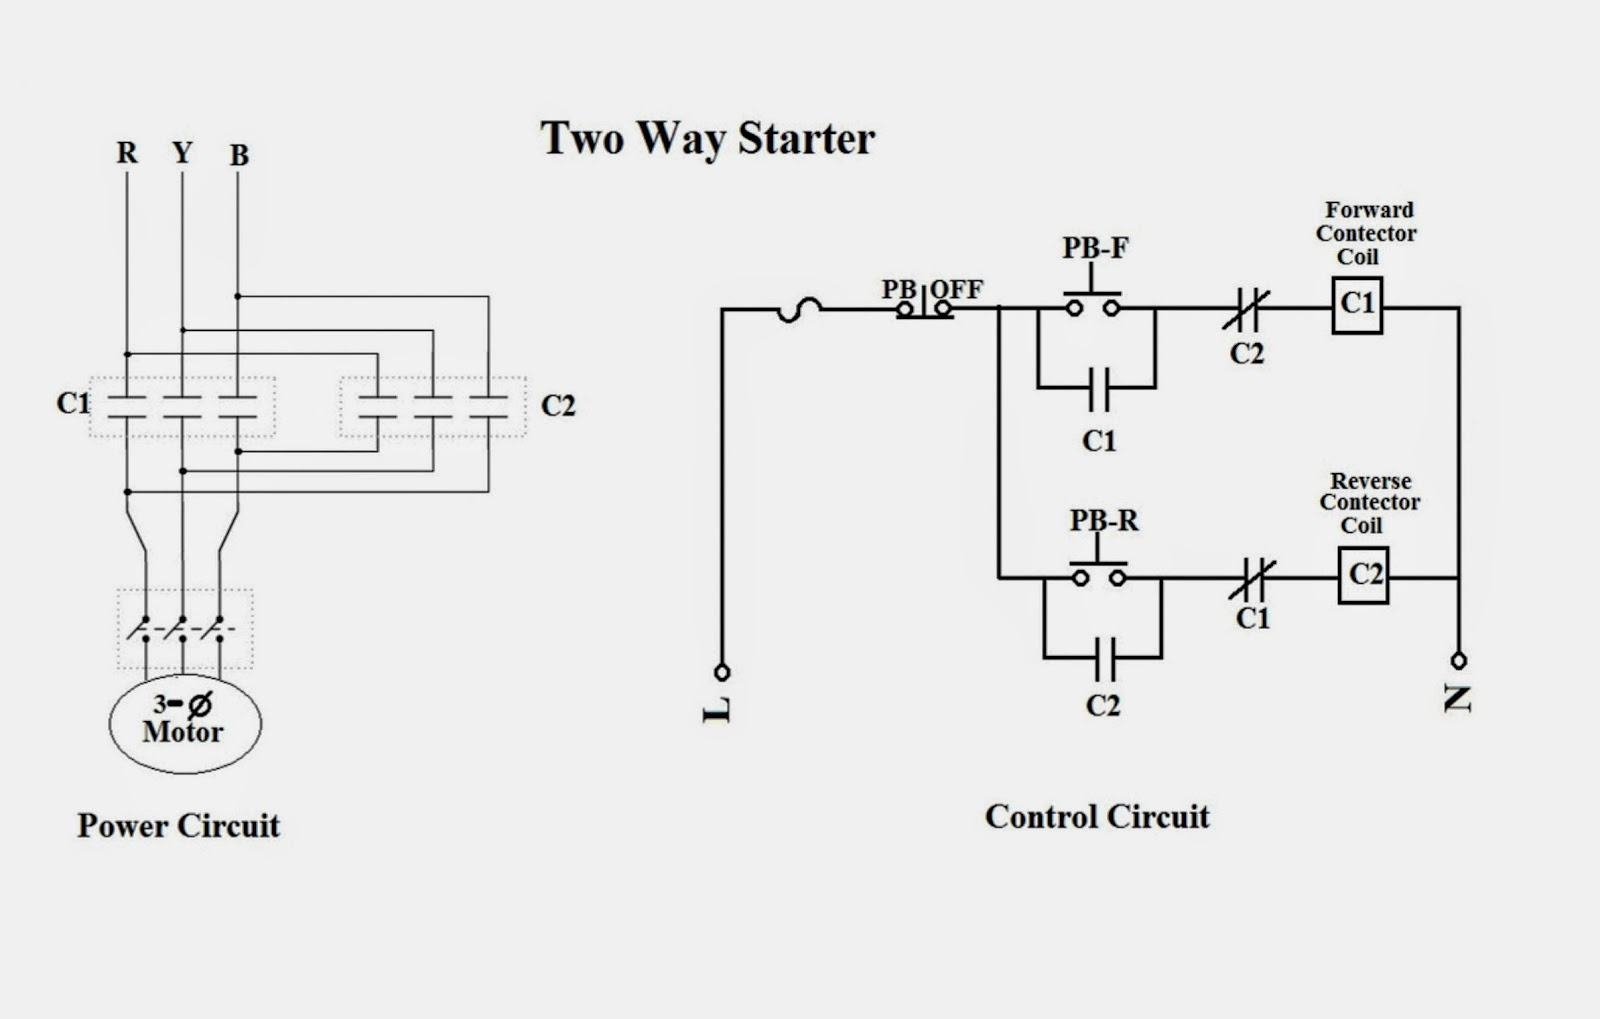 medium resolution of 300zx hks turbo timer wiring diagram wiring libraryturbo timer wiring diagram training report on bokaro steel